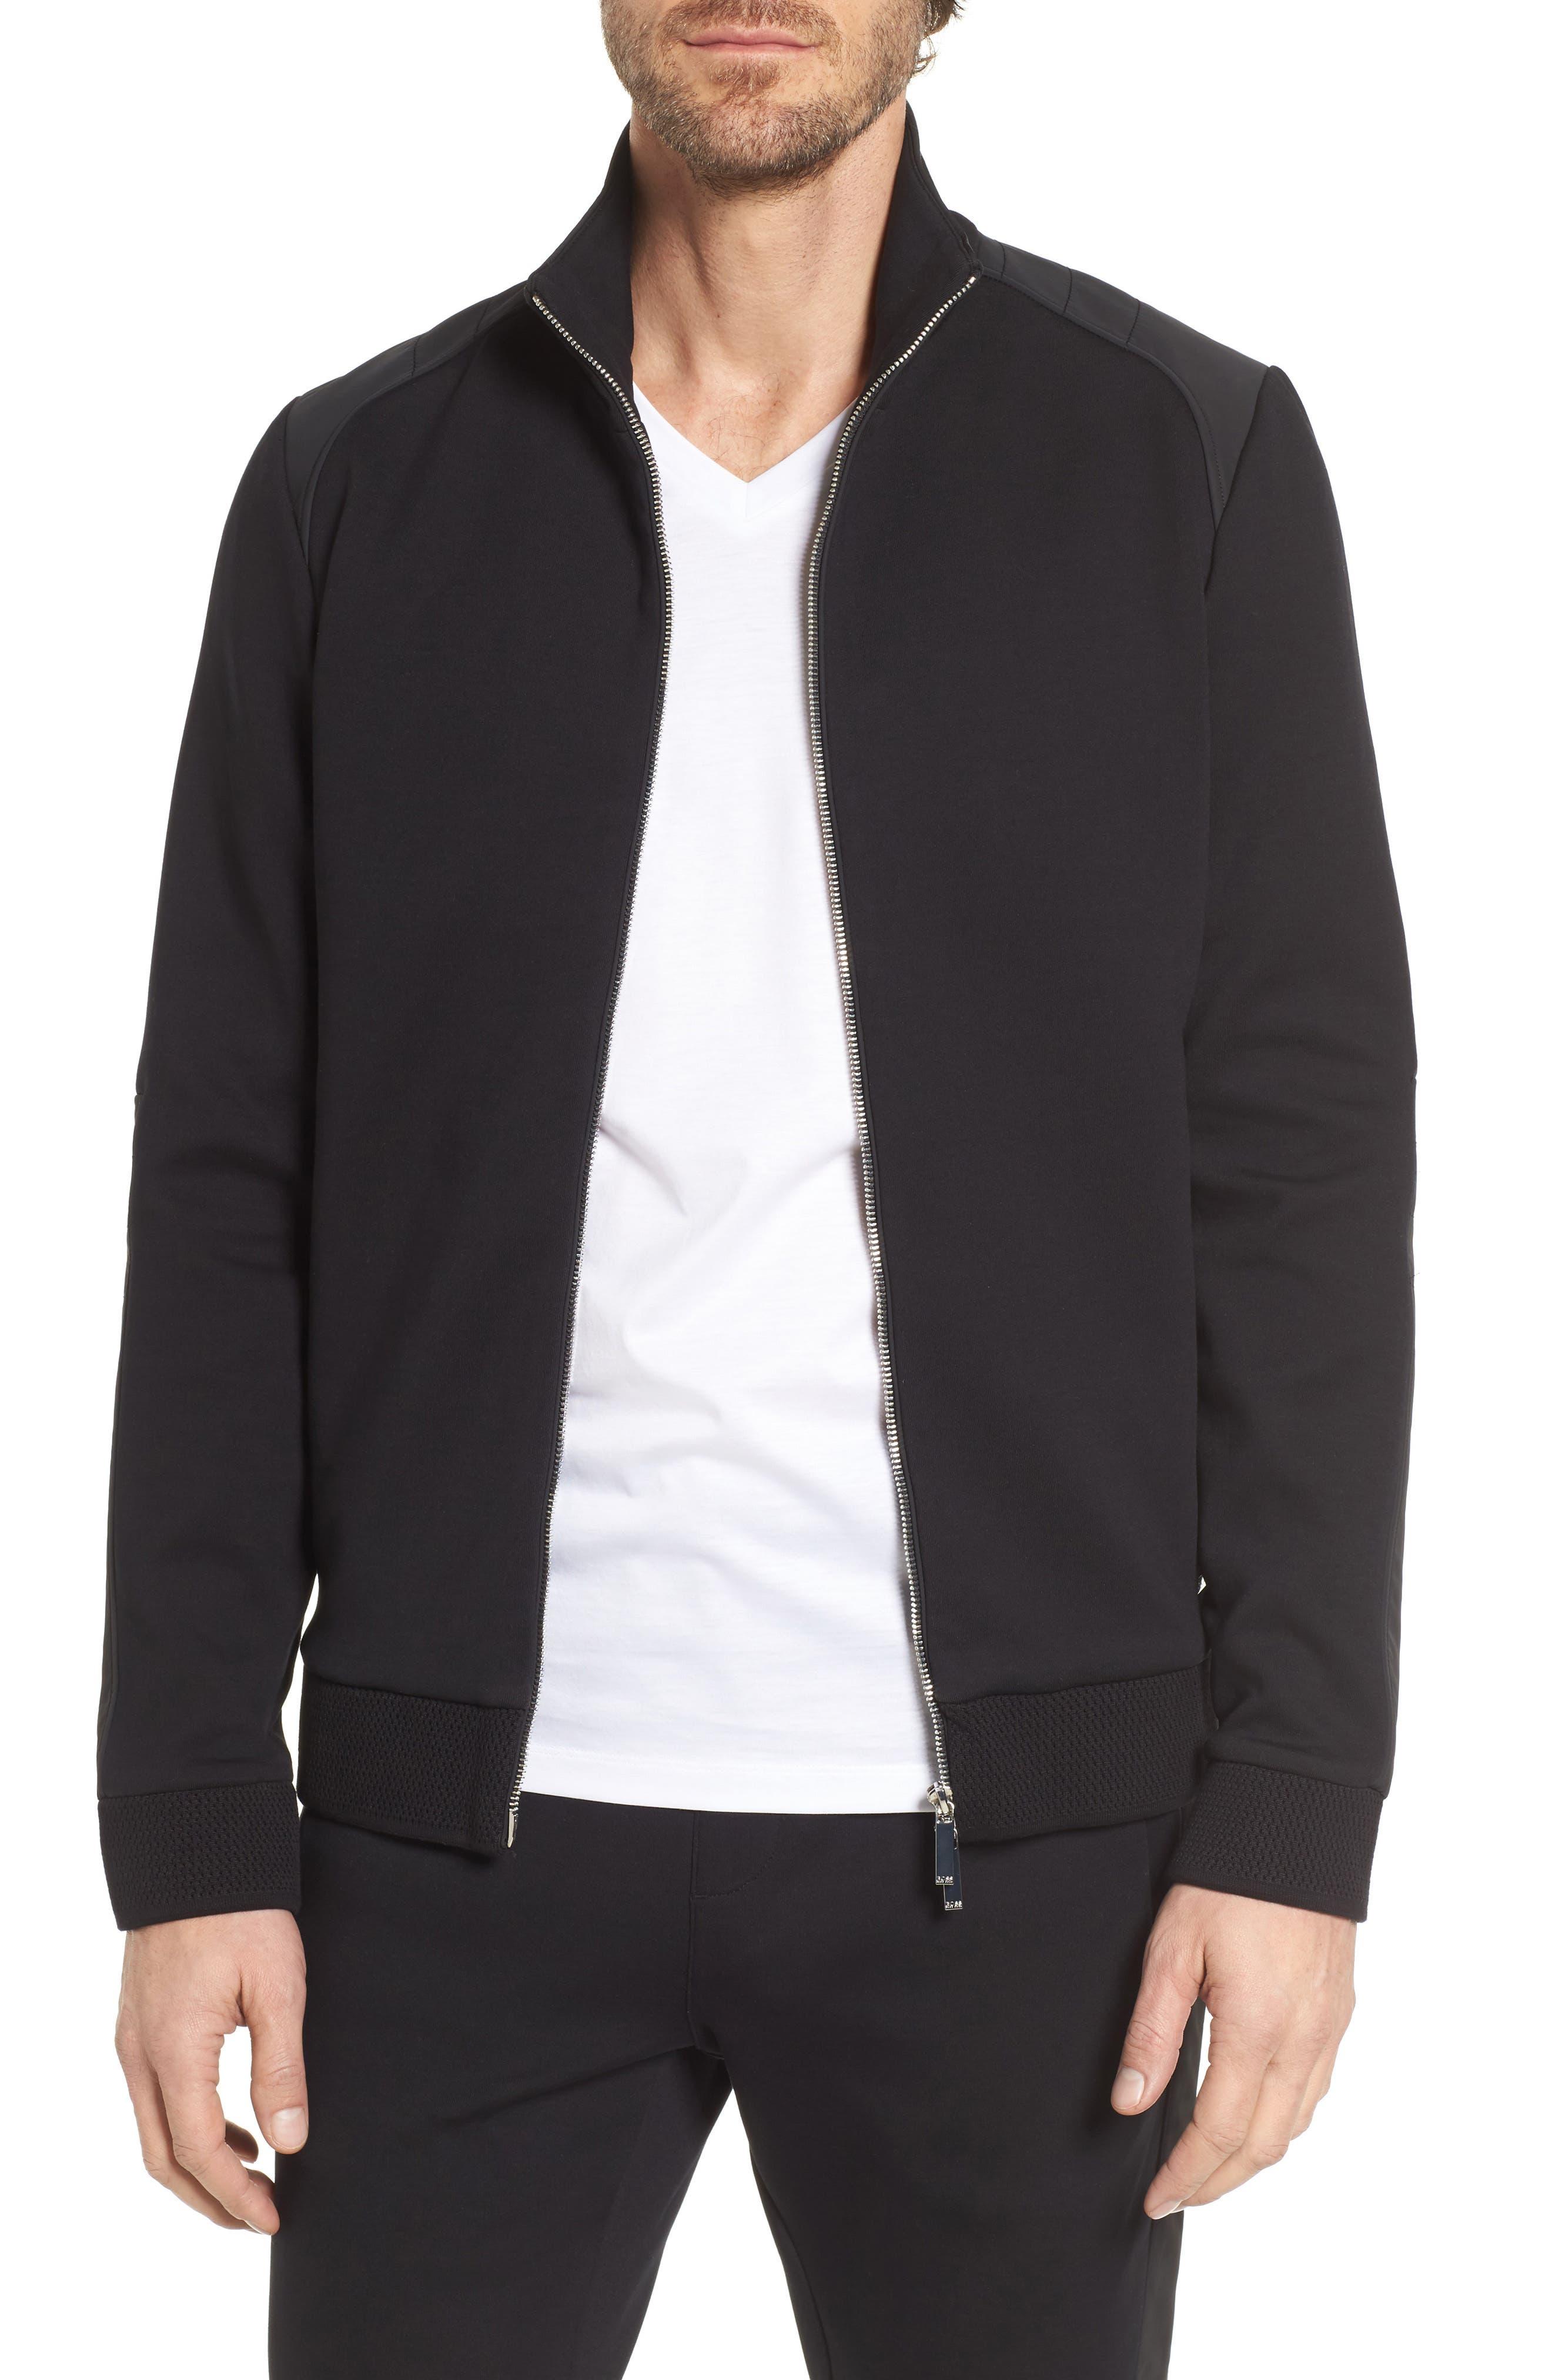 Soule Mercedes Slim Fit Zip Jacket,                         Main,                         color, 001